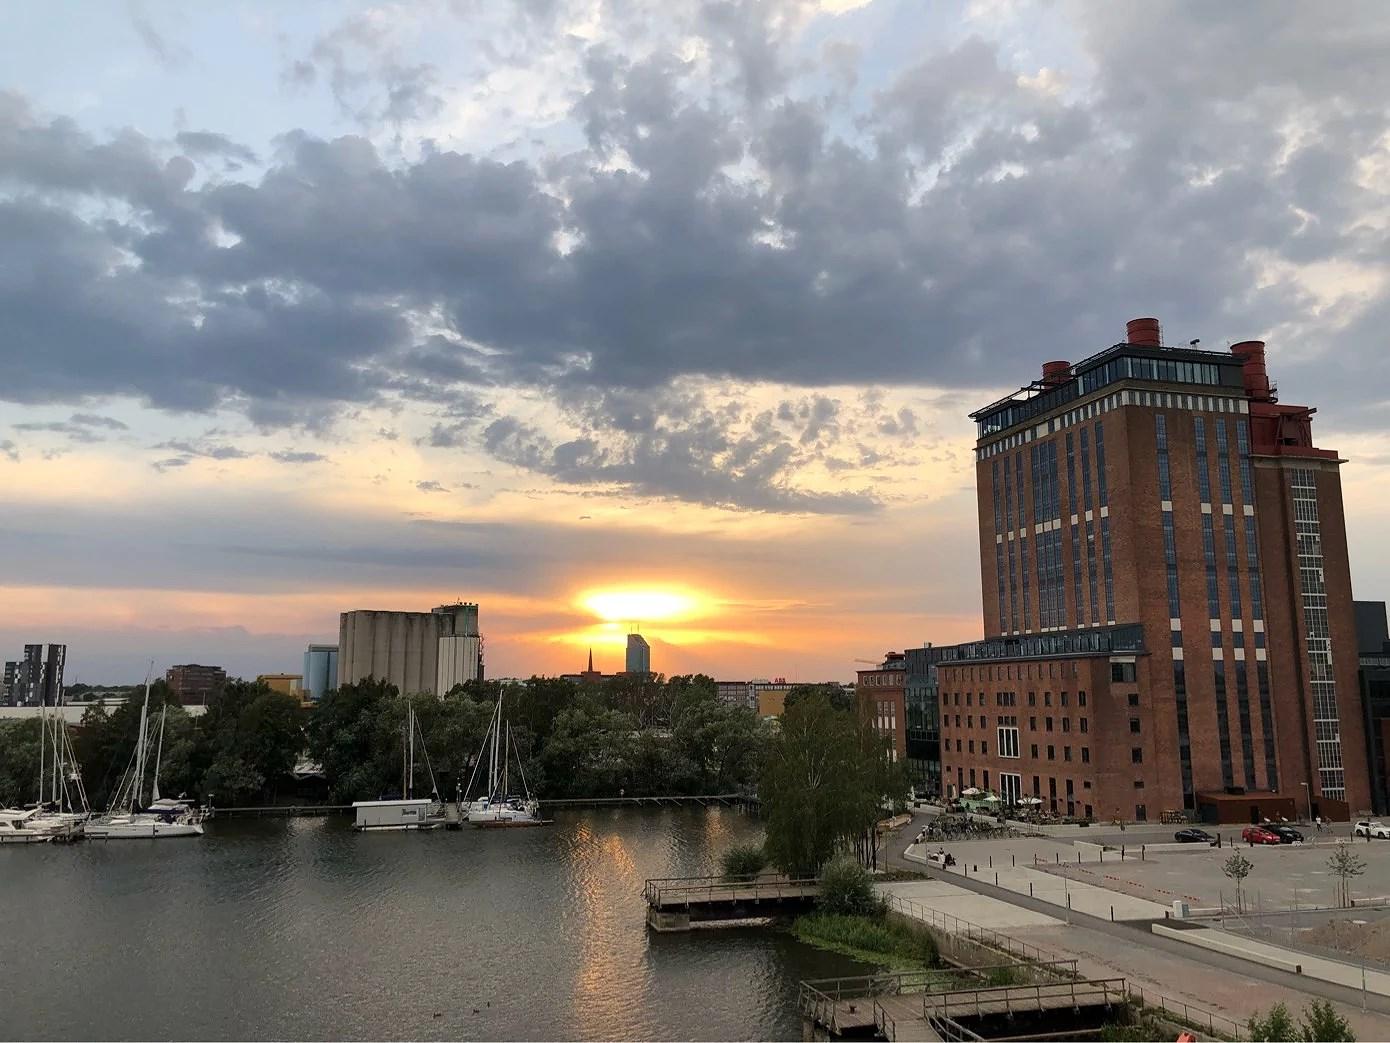 Magisk solnedgång bakom himlen